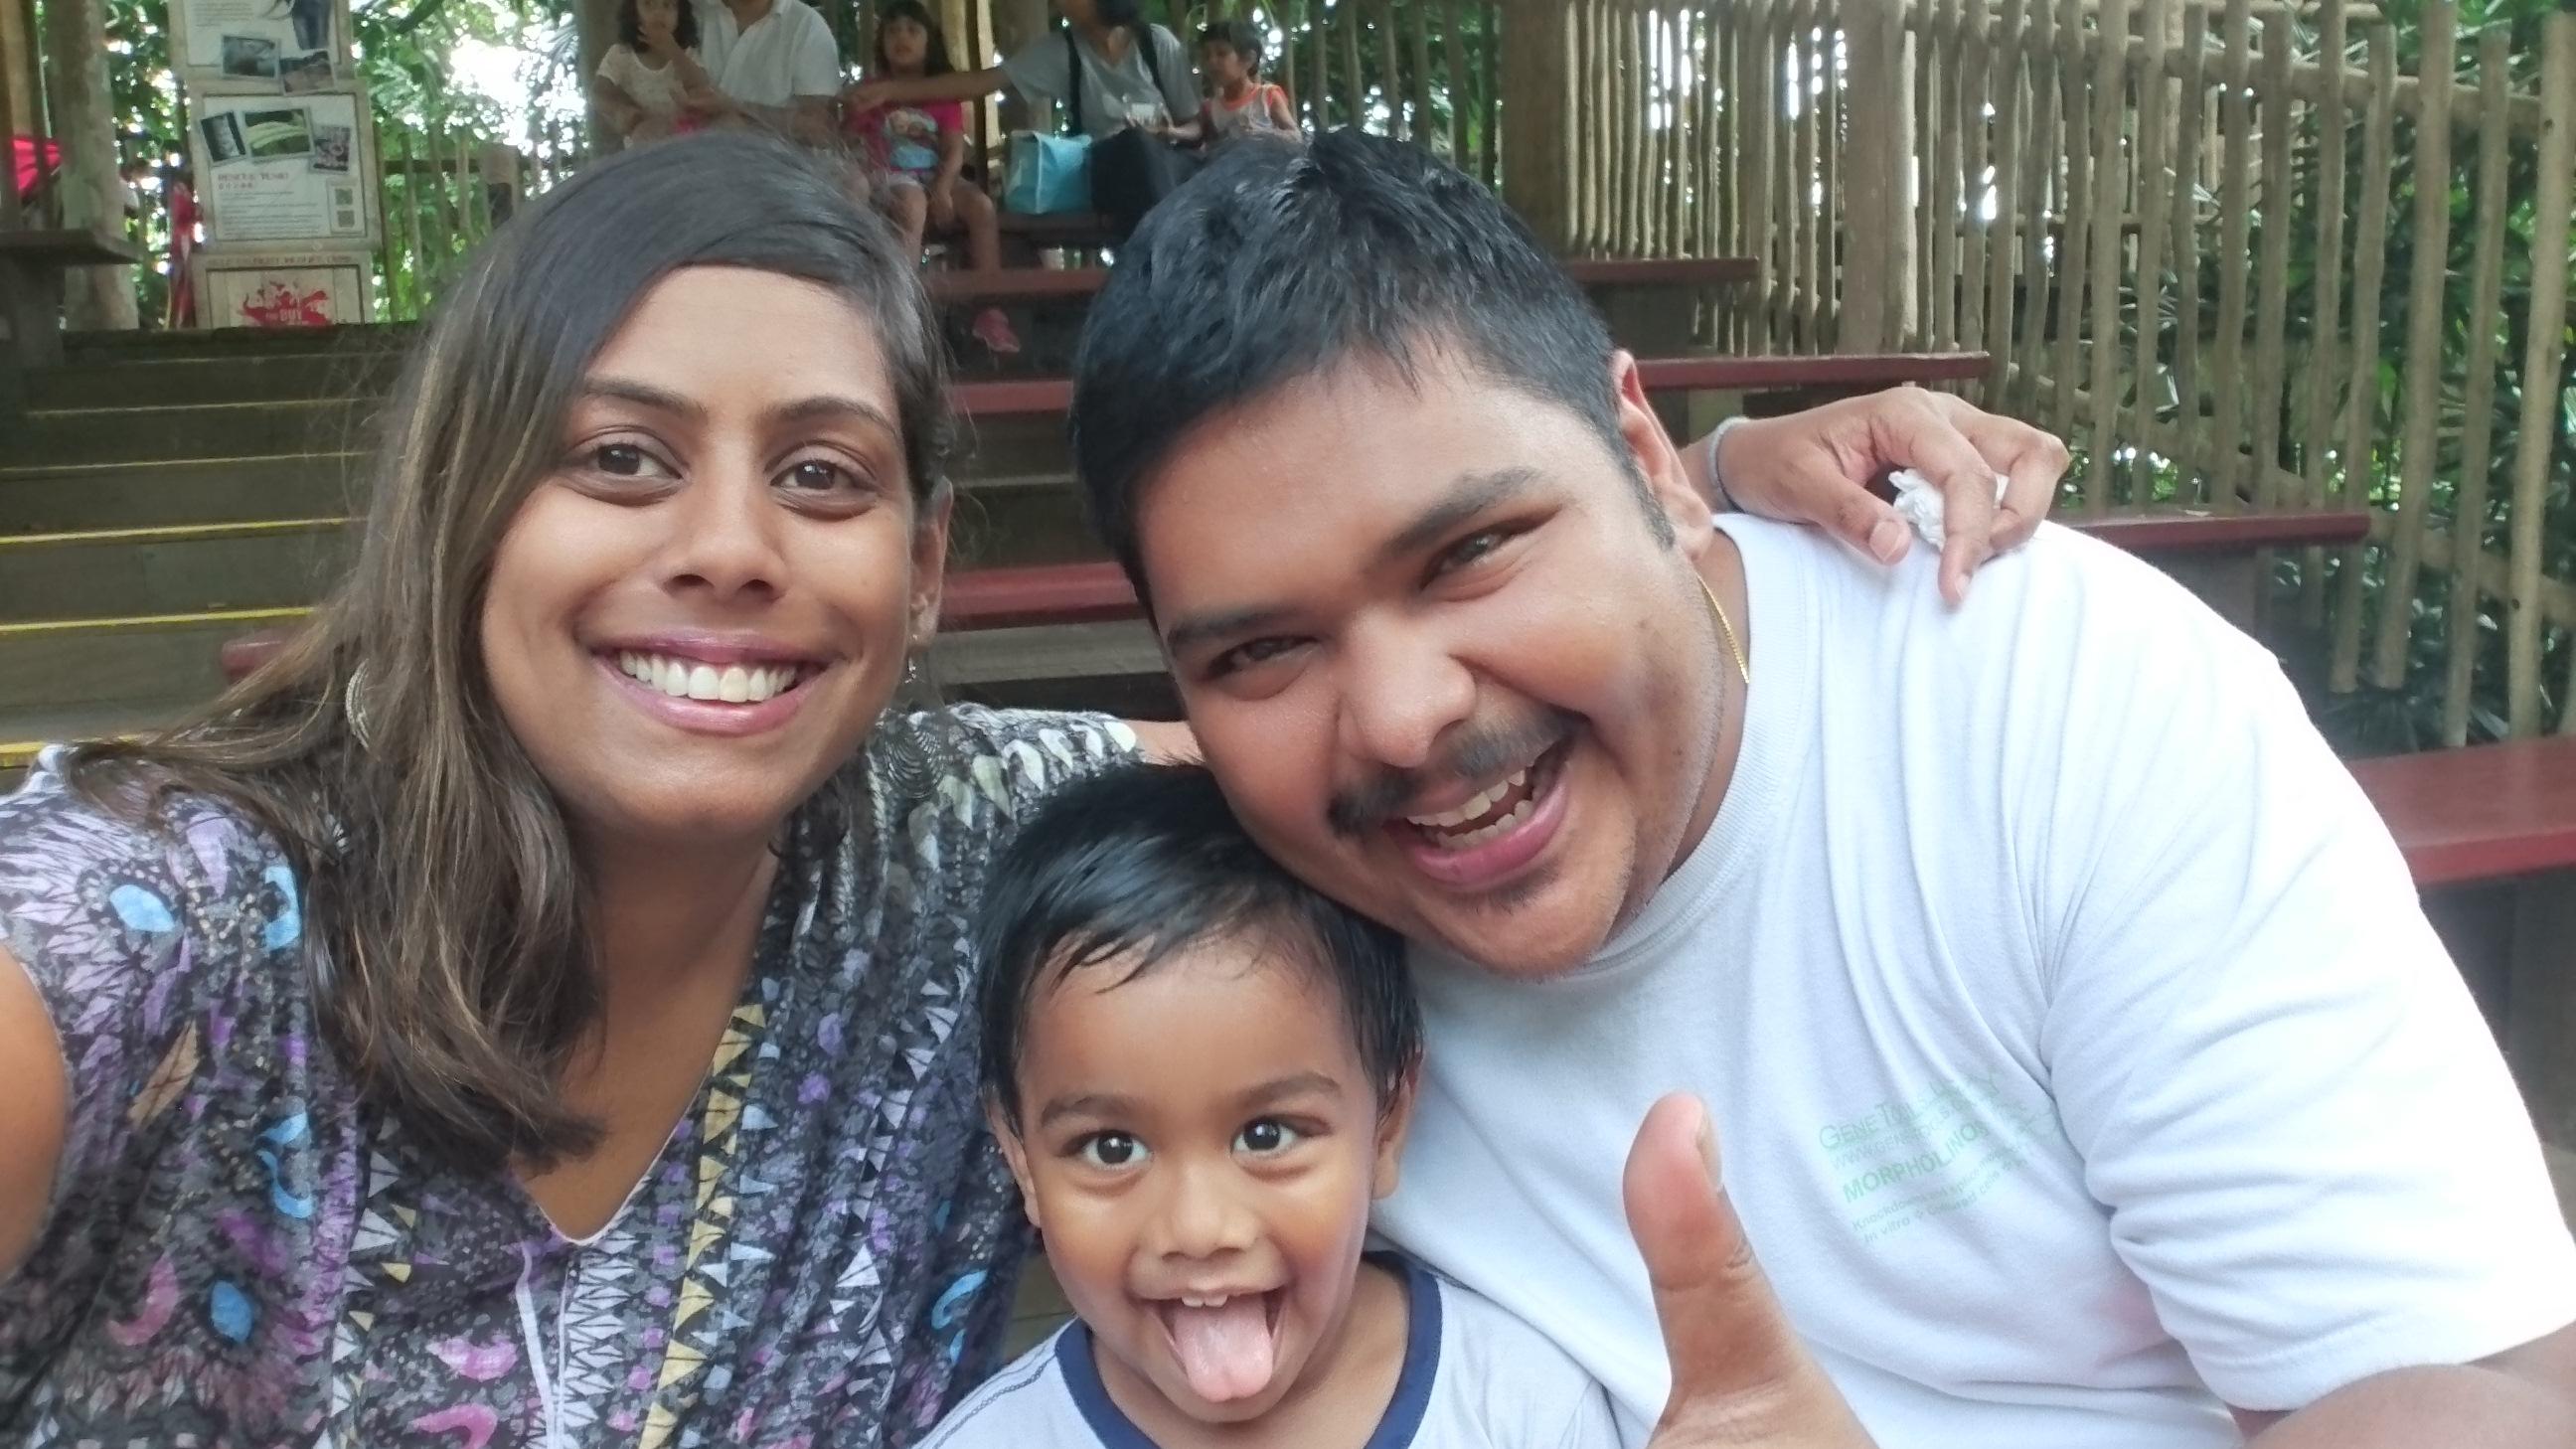 Saravanan Manorkorum and Amutha